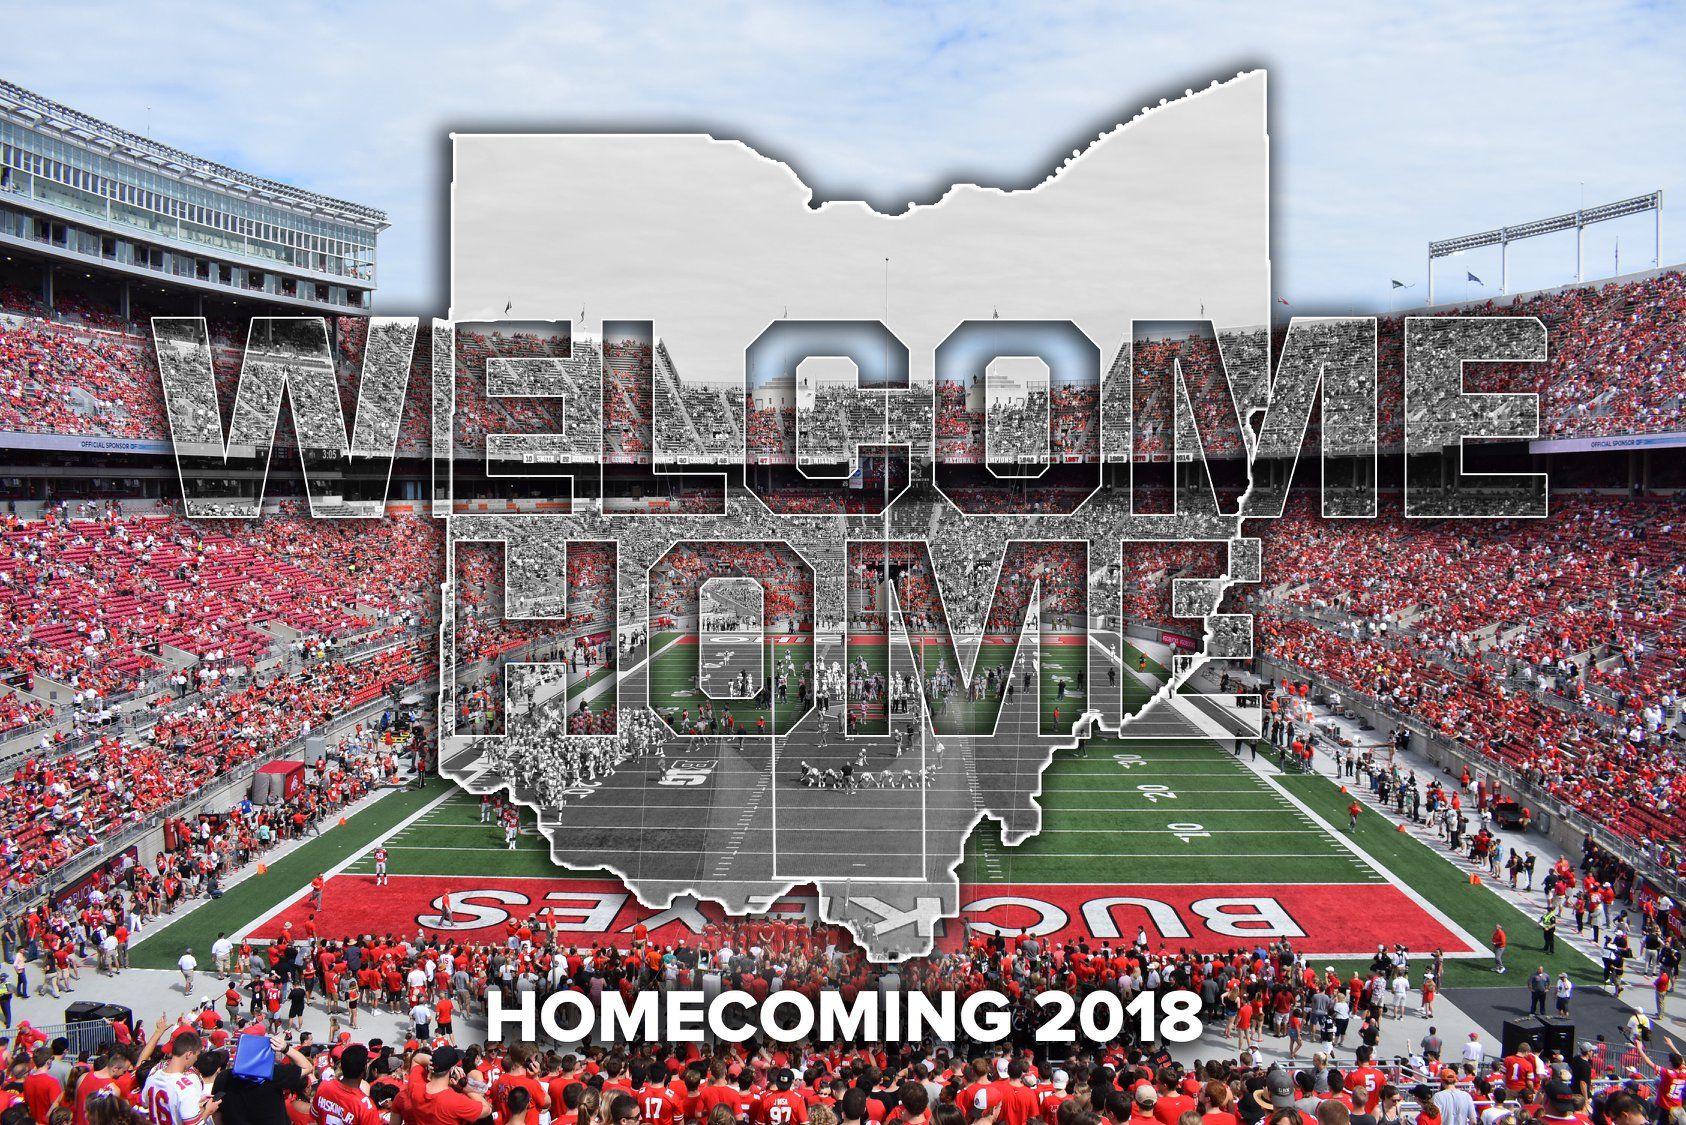 10 6 2018 Game 6 Indiana Vs The 2018 Homecoming Ohio State